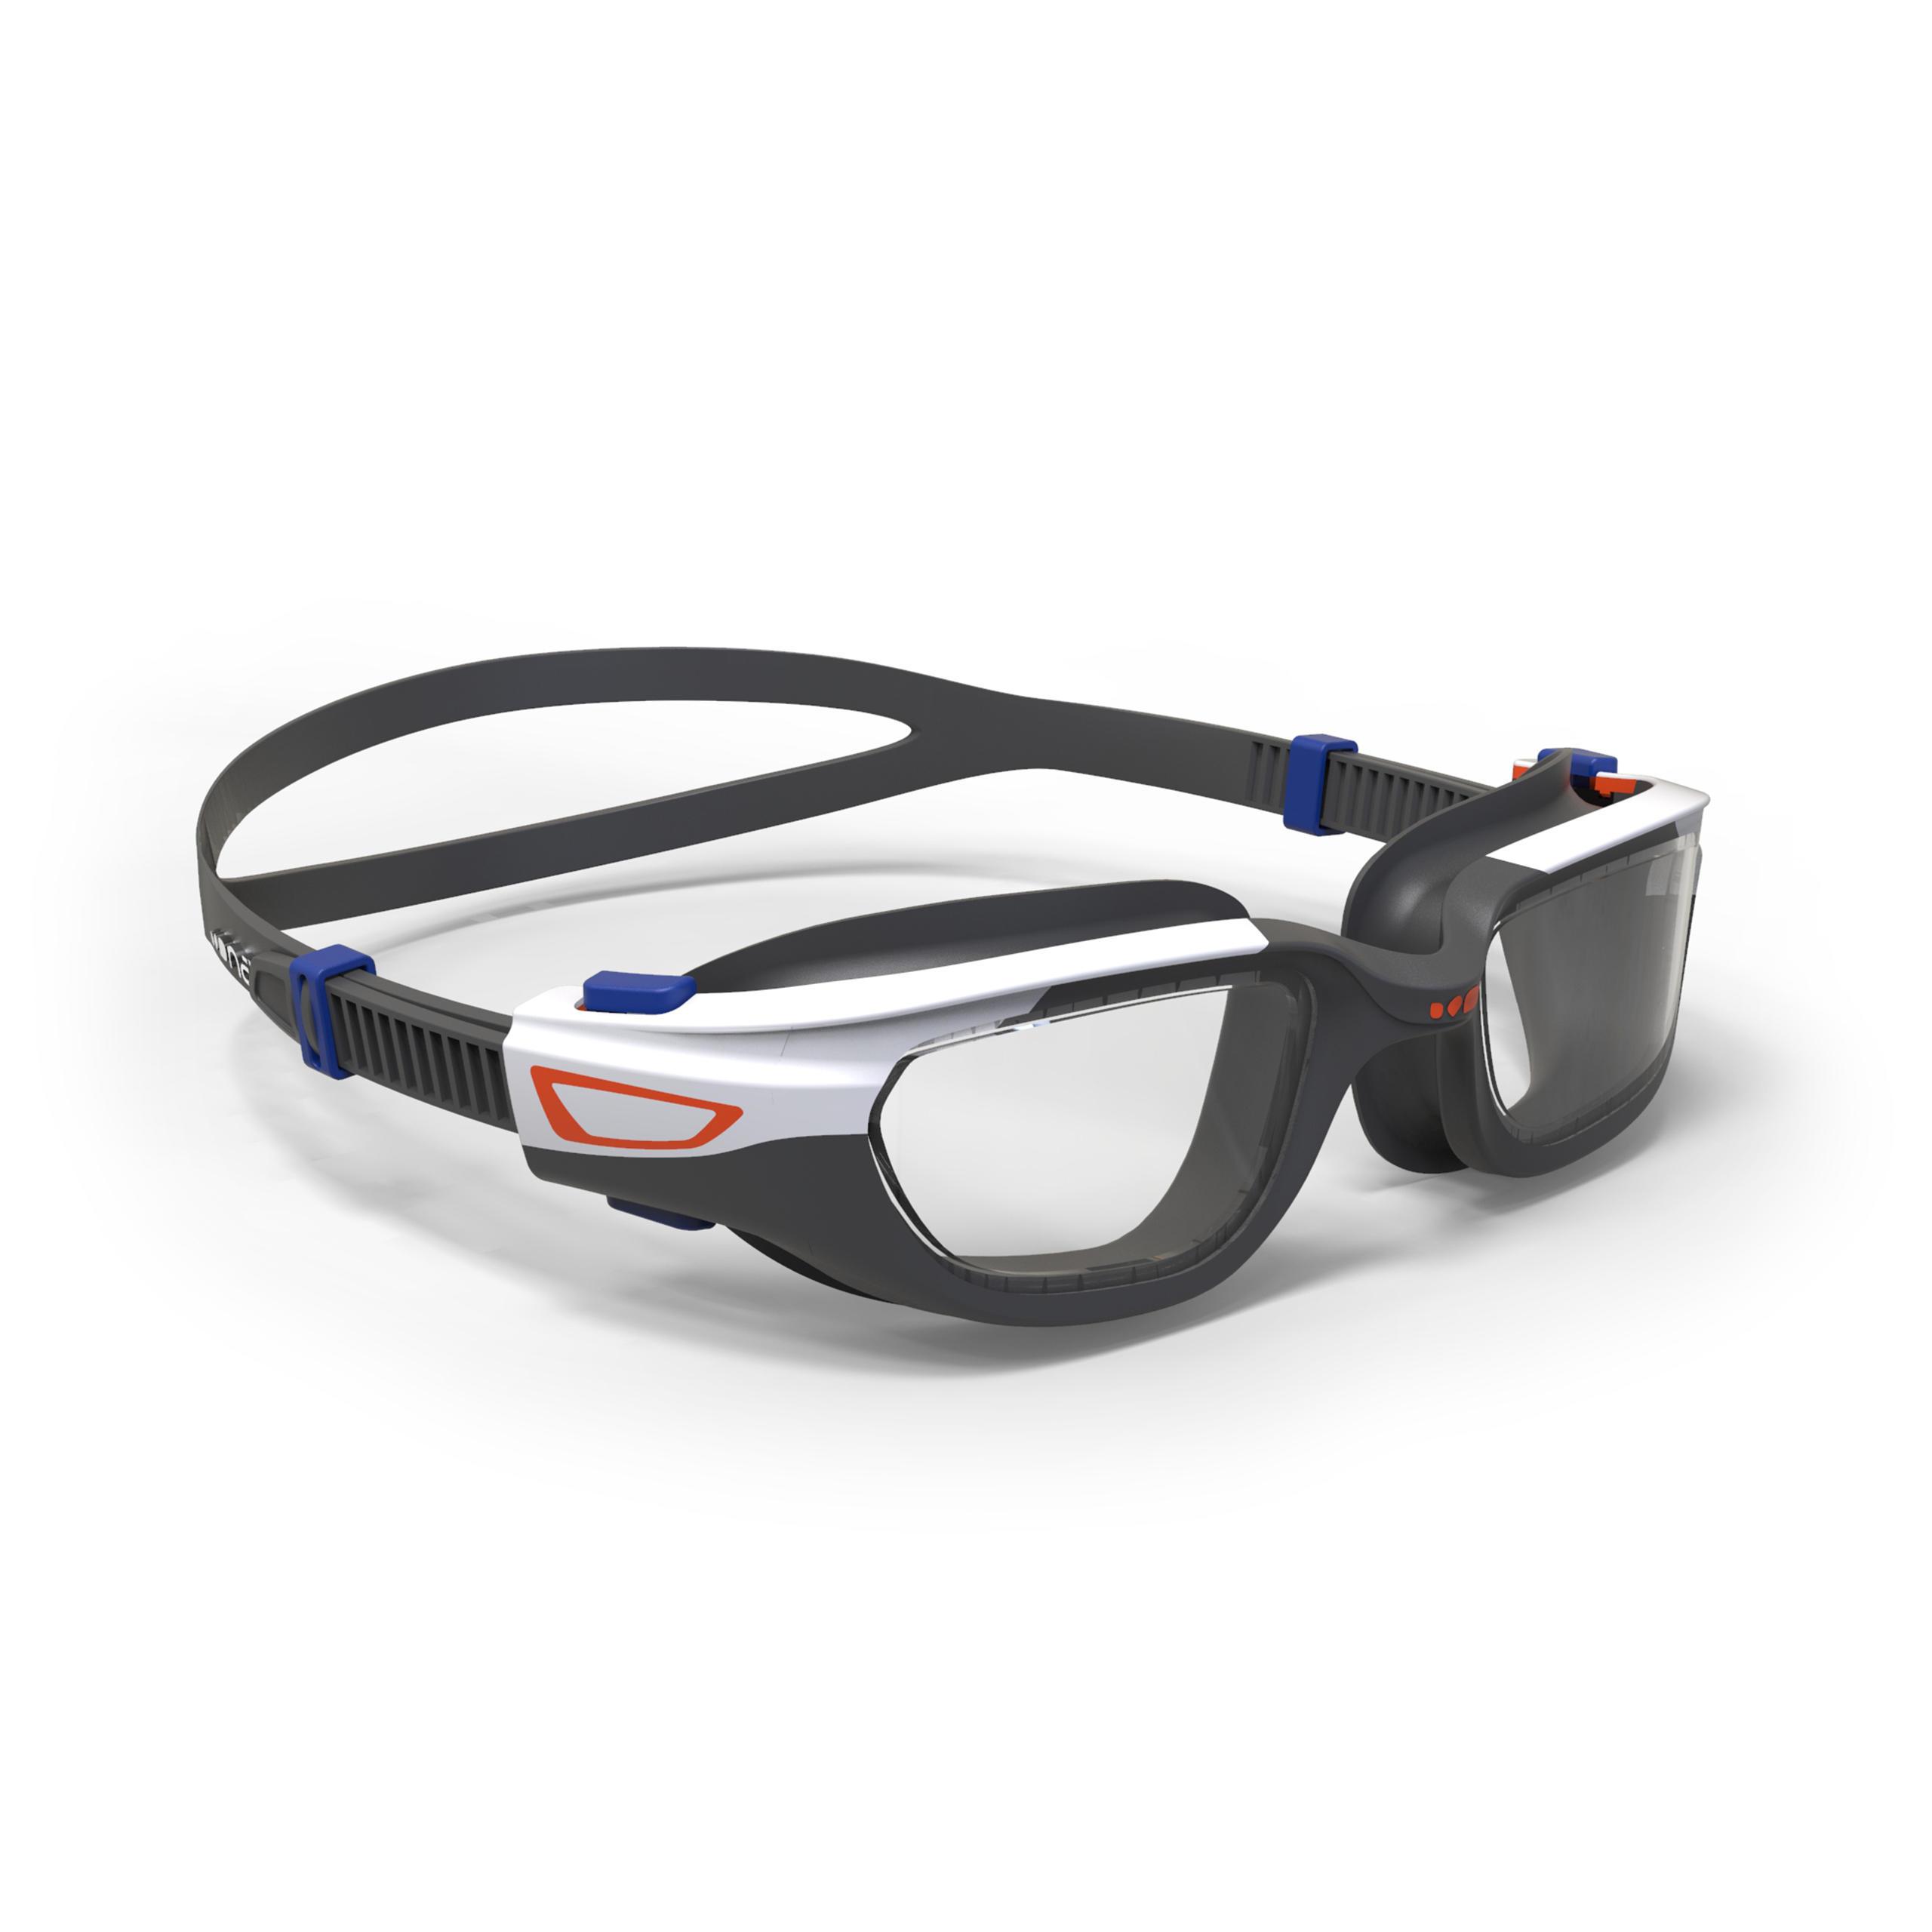 fa0eb9ede1 Comprar Gafas de Natación Online | Decathlon